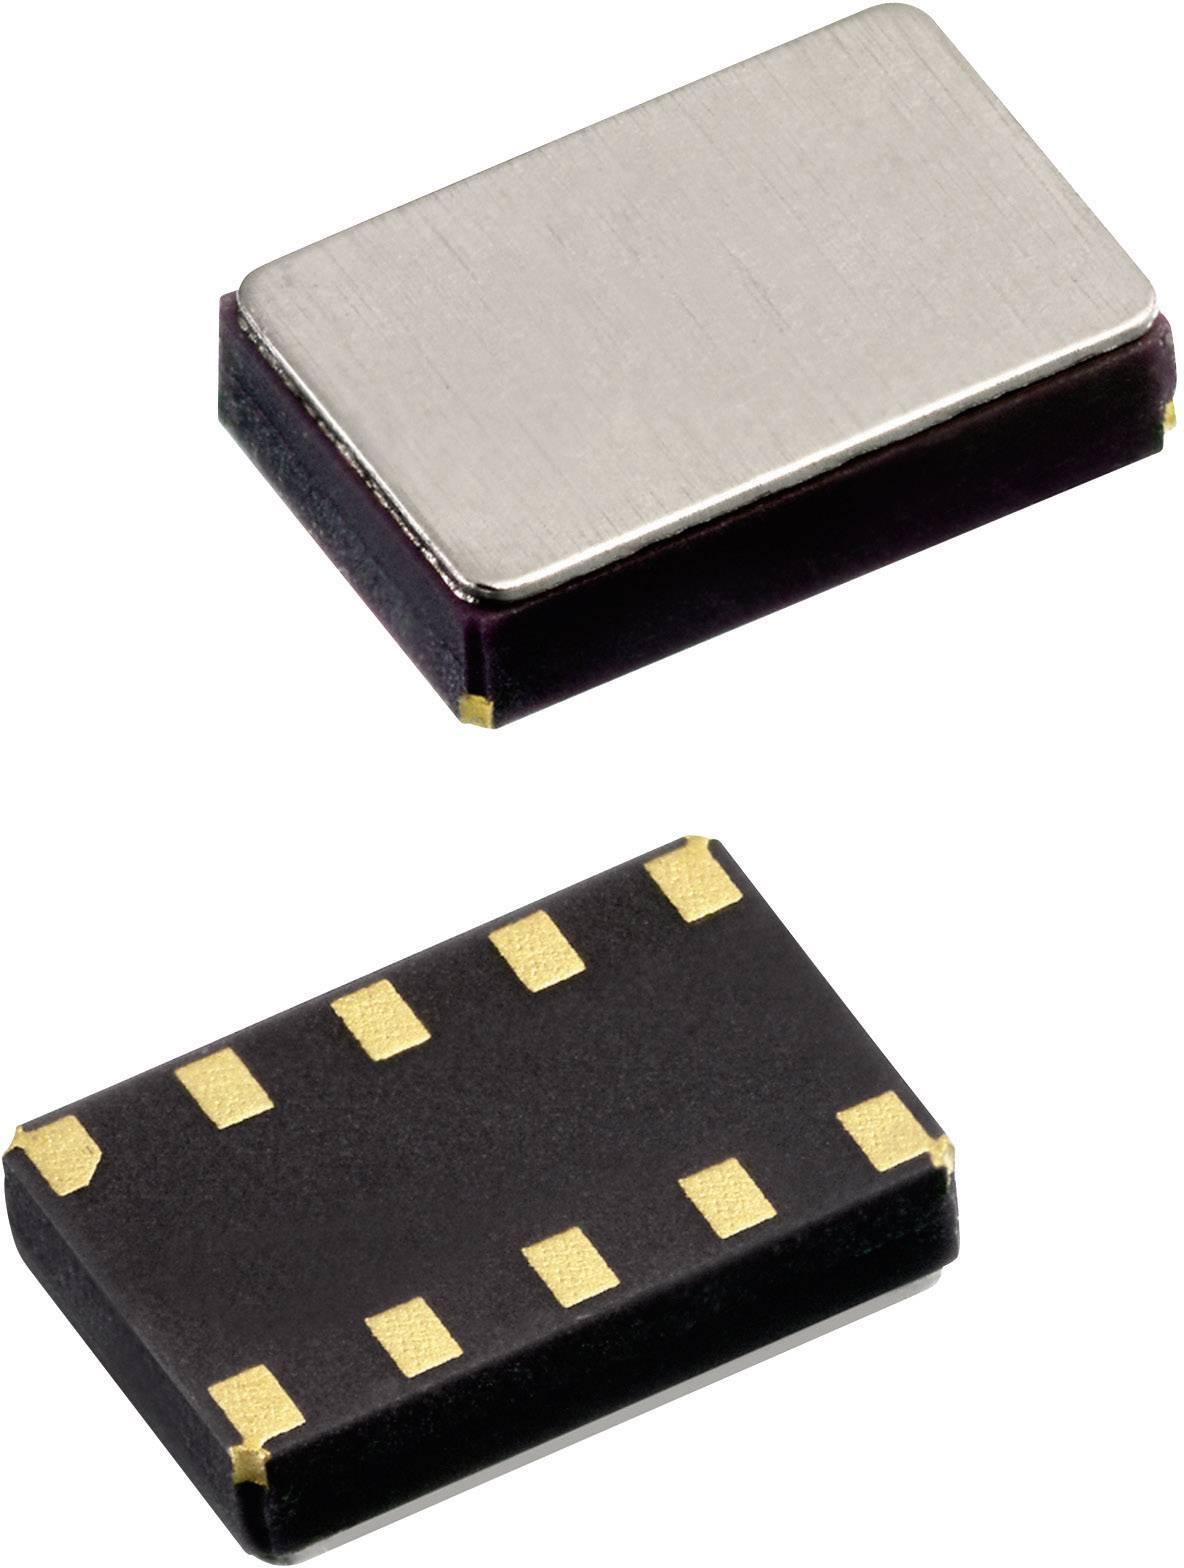 SMD krystal MicroCrystal, RV-8523-C3-TA-20ppm